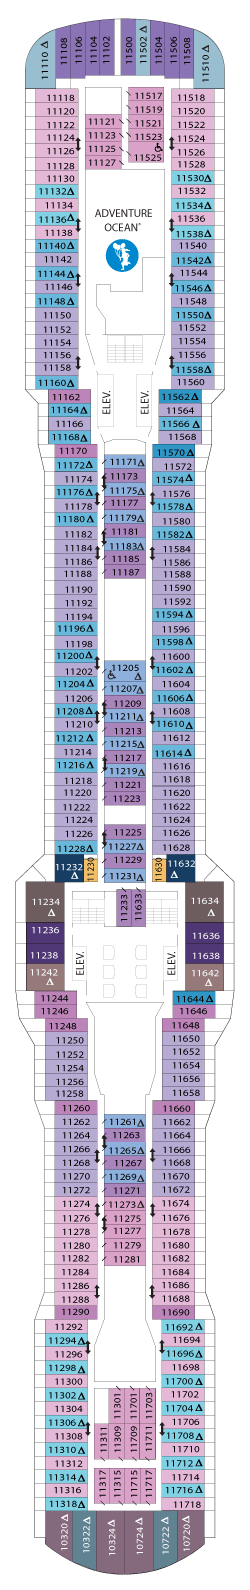 Ovation of the Seas Deck 11